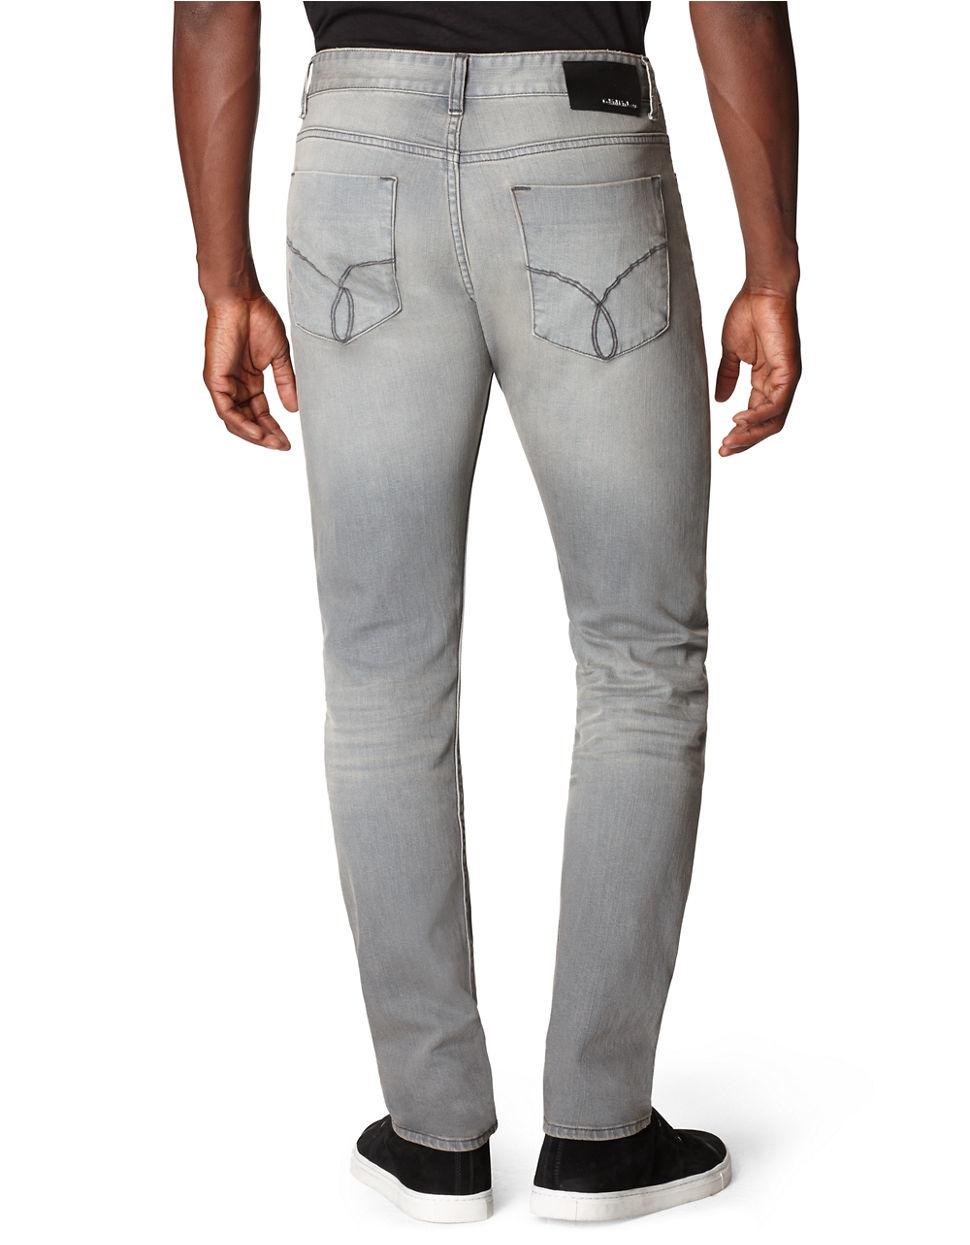 calvin klein jeans slim straight leg jeans in gray for men. Black Bedroom Furniture Sets. Home Design Ideas